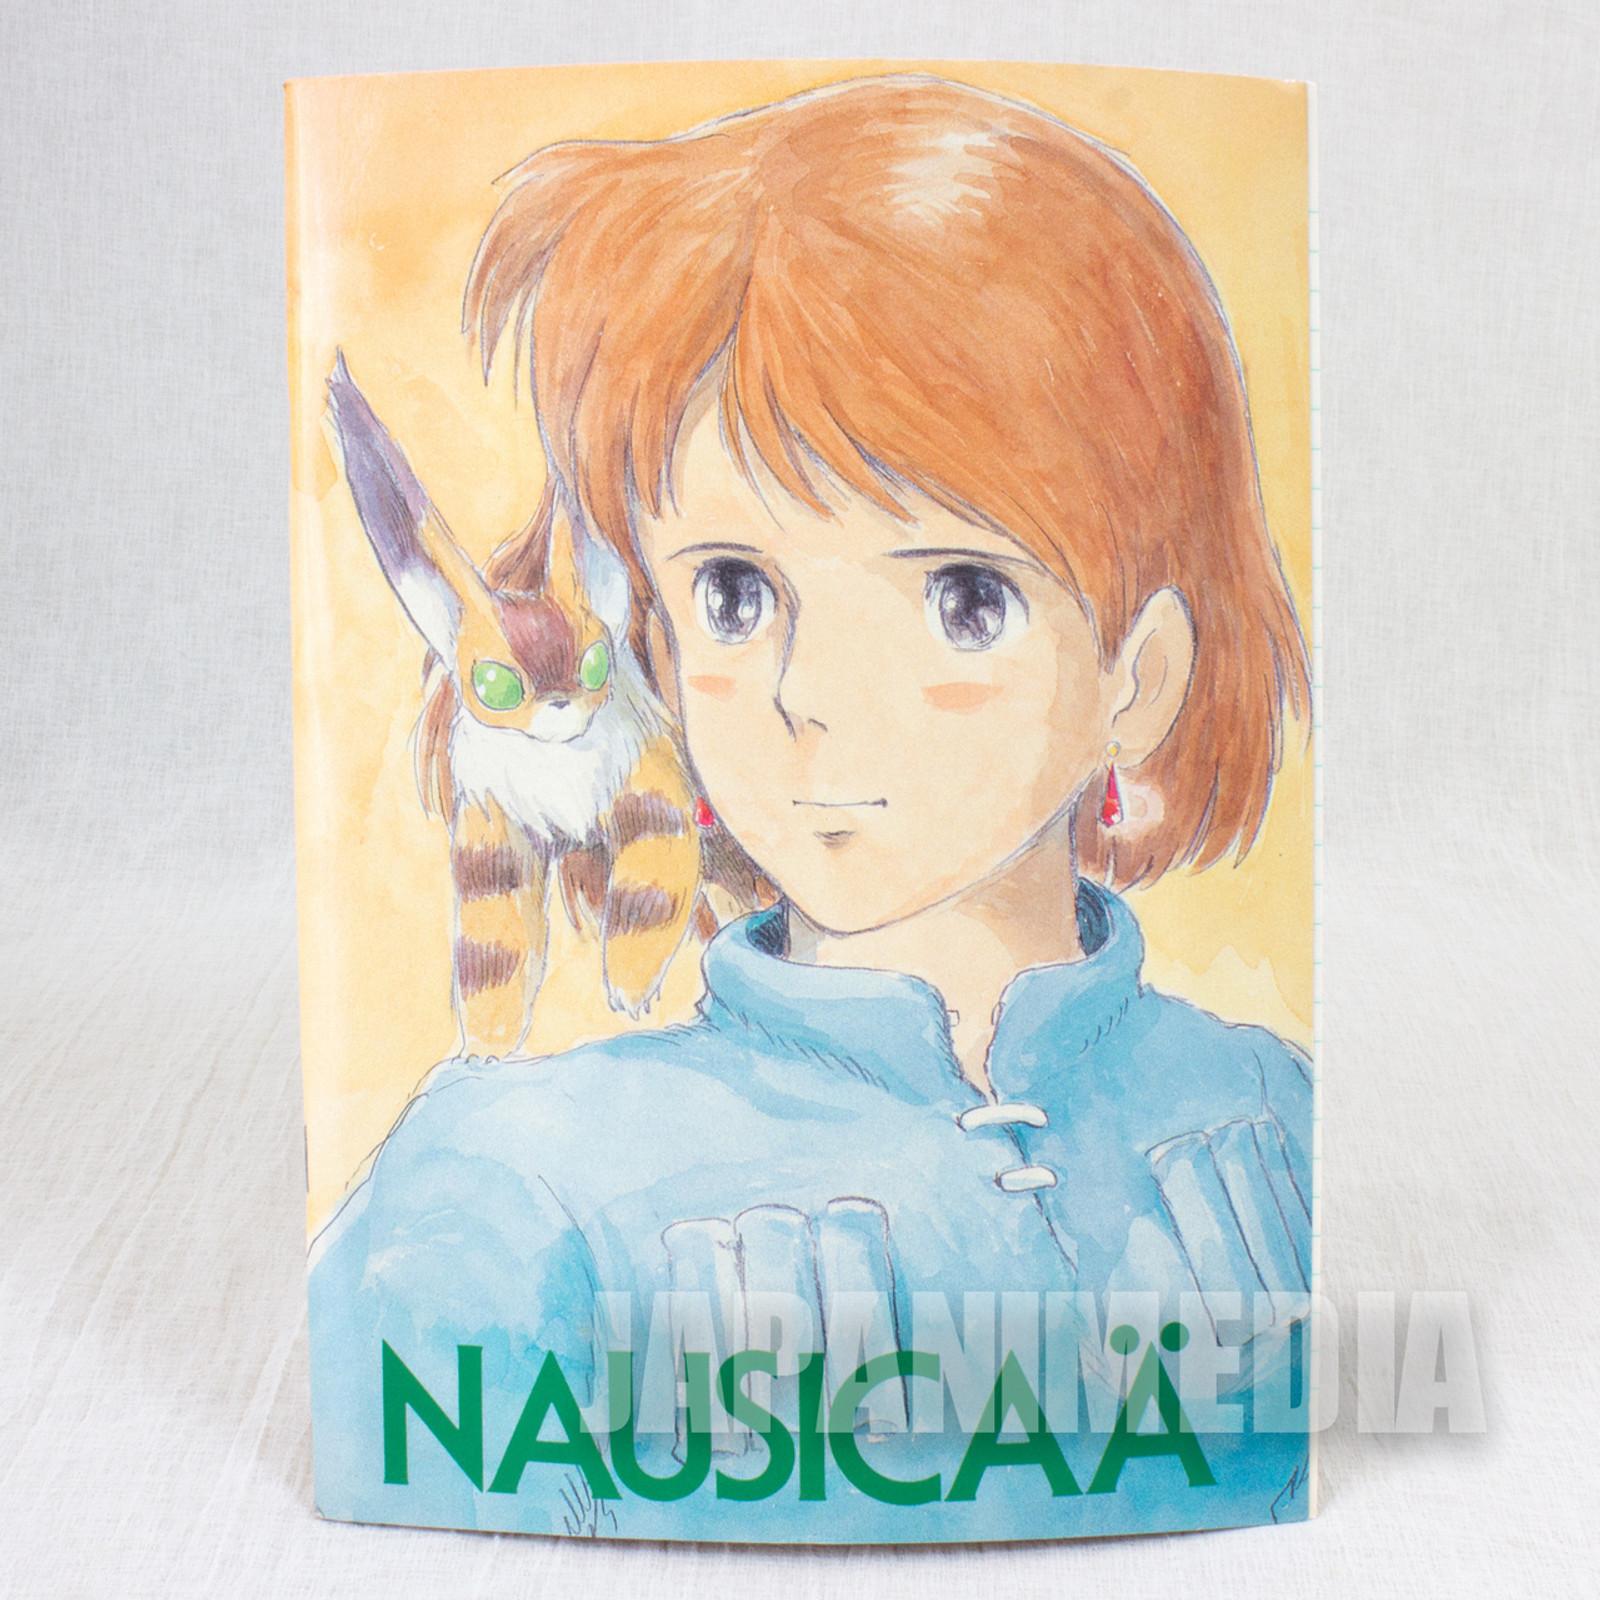 Retro RARE Nausicaa of the Valley Notebook #1 Ghibli JAPAN ANIME MANGA